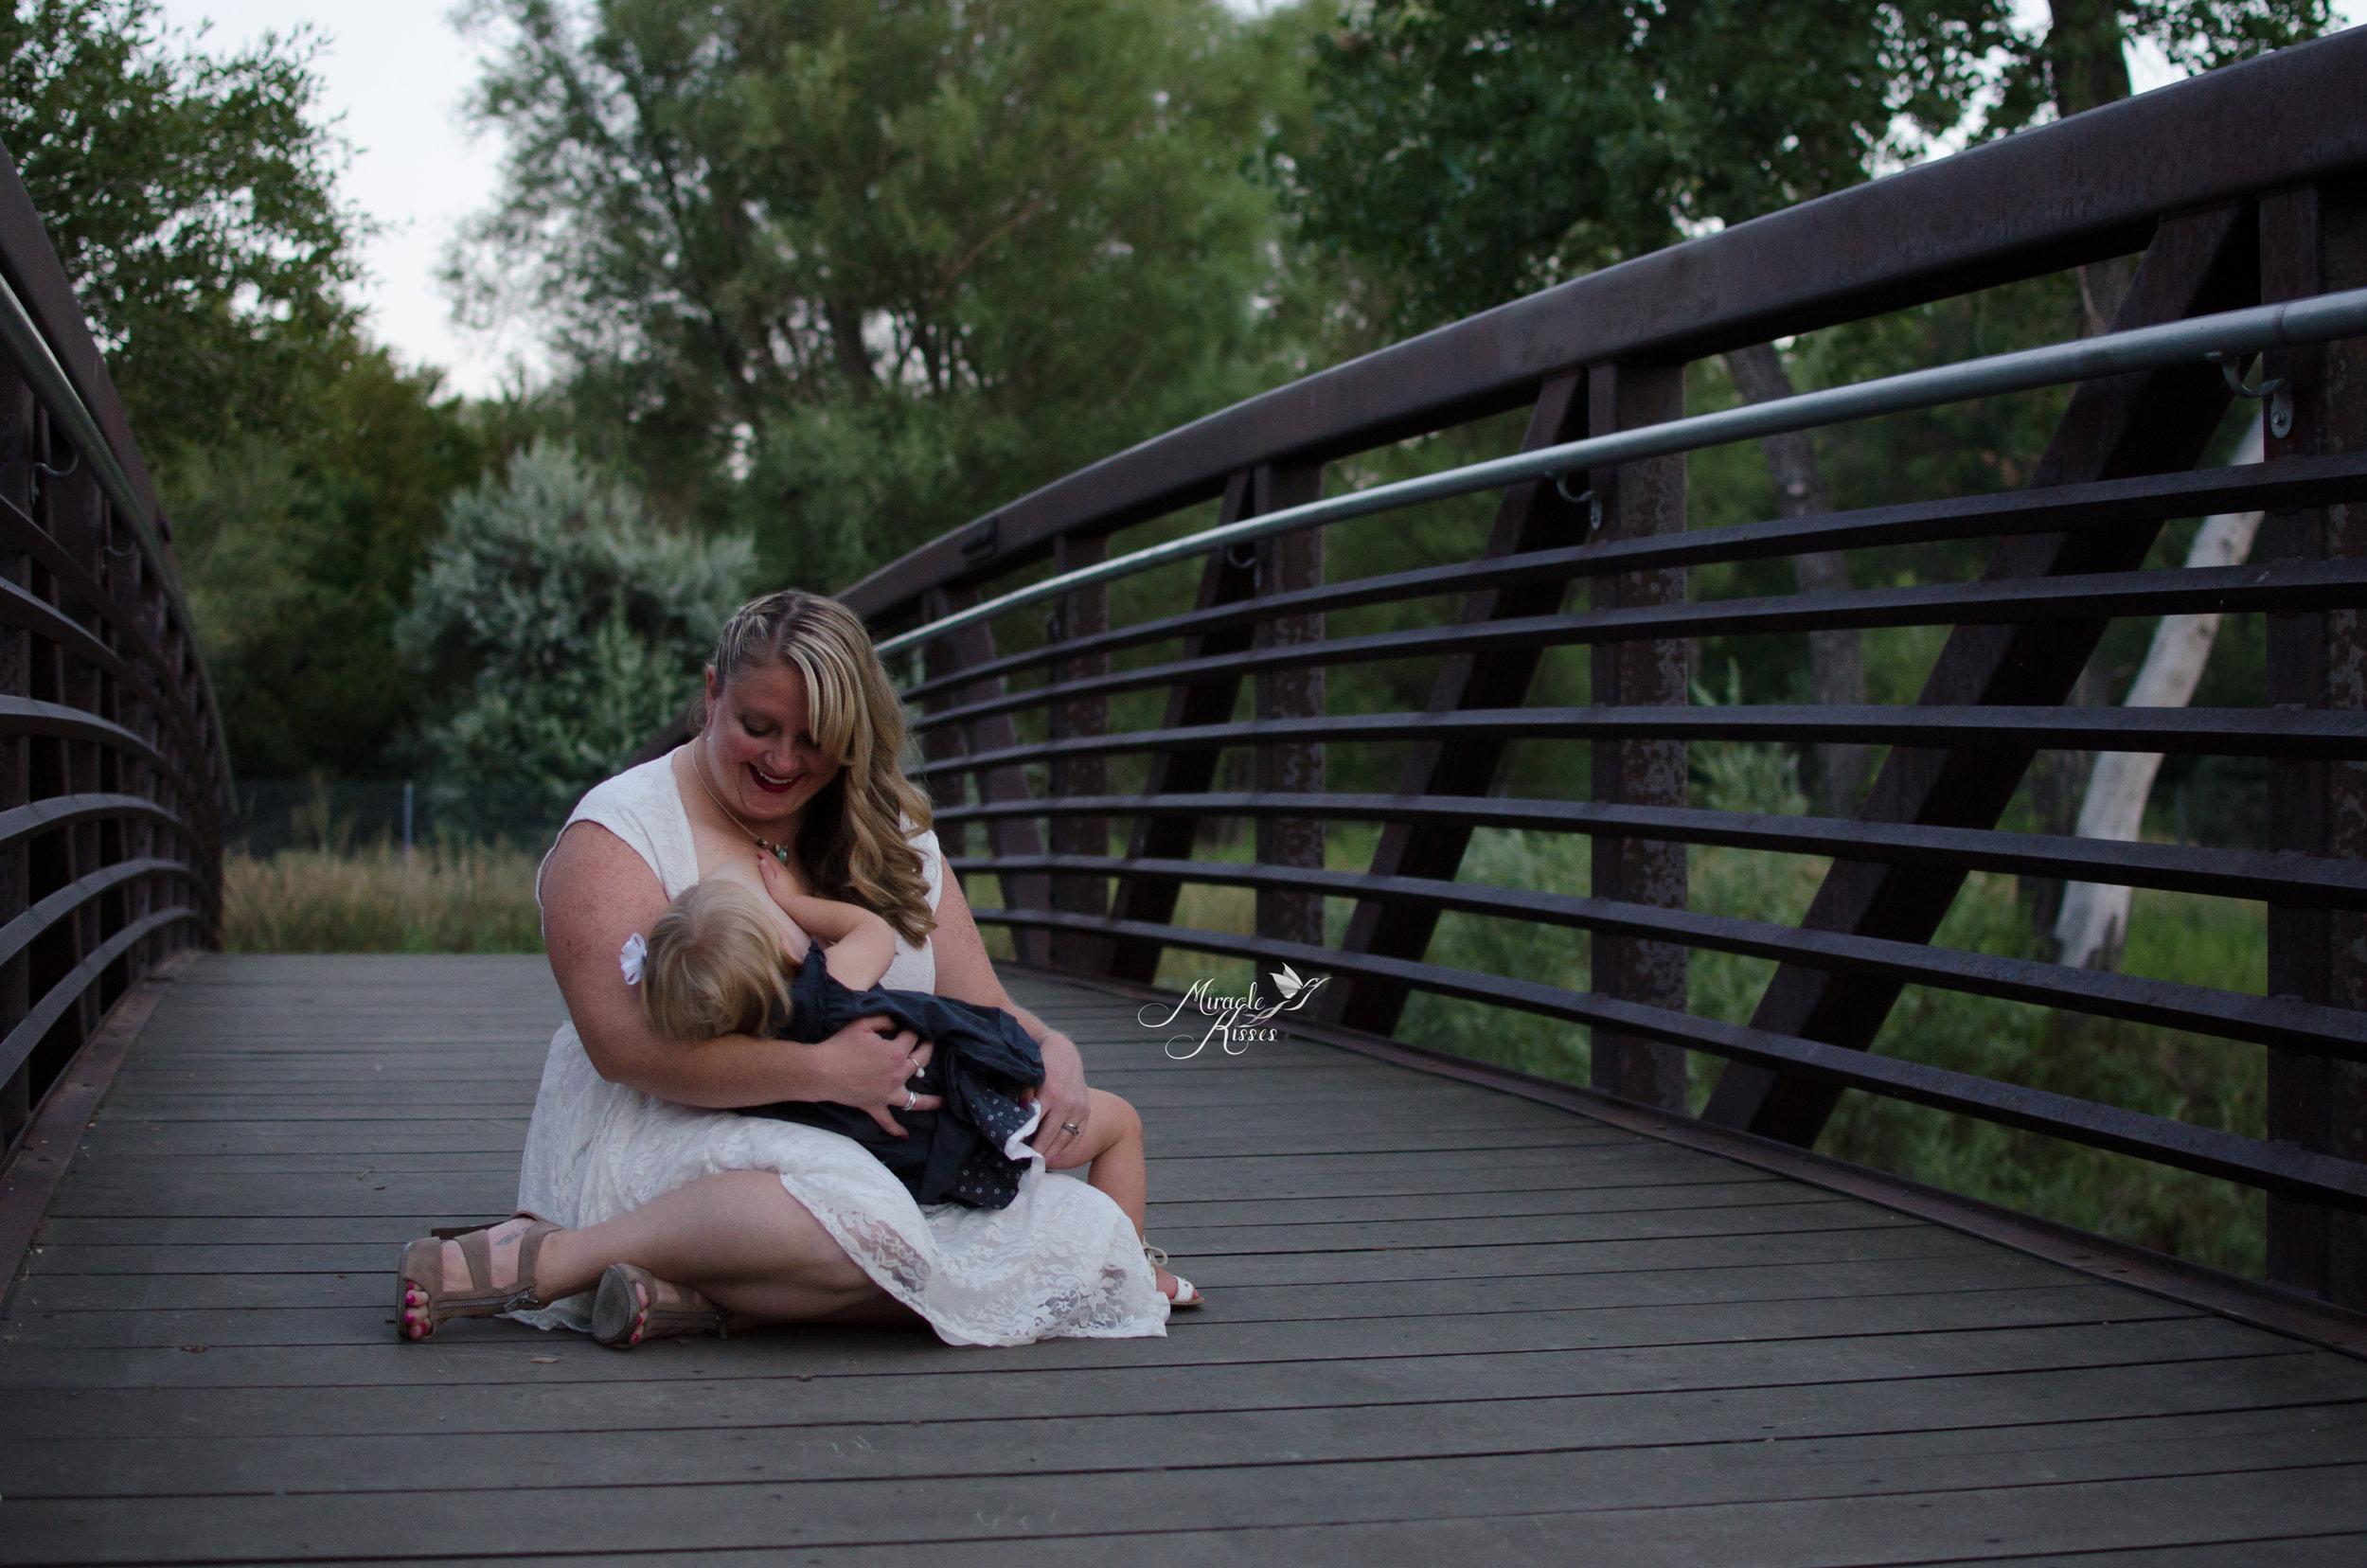 nurse on a bridge, mommy and me, moms love